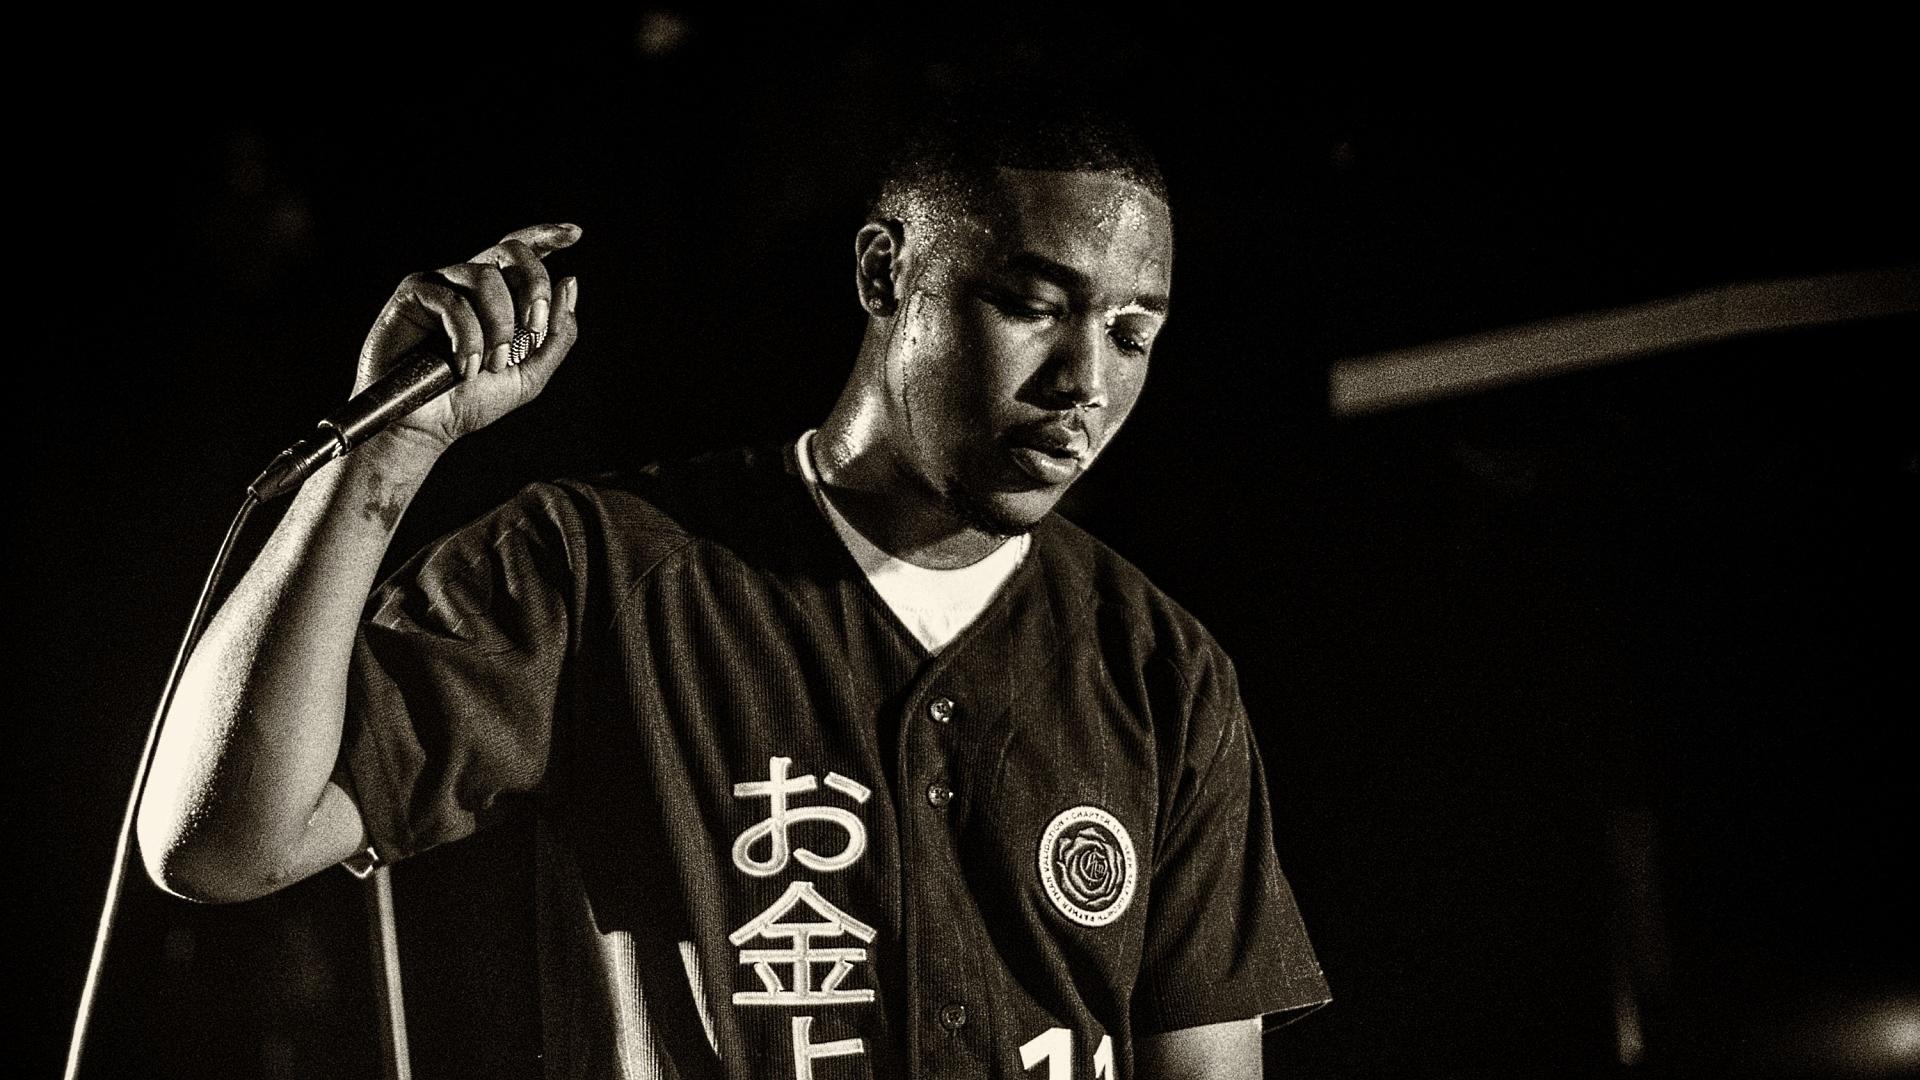 Soulful Jazzy Hip Hop beat